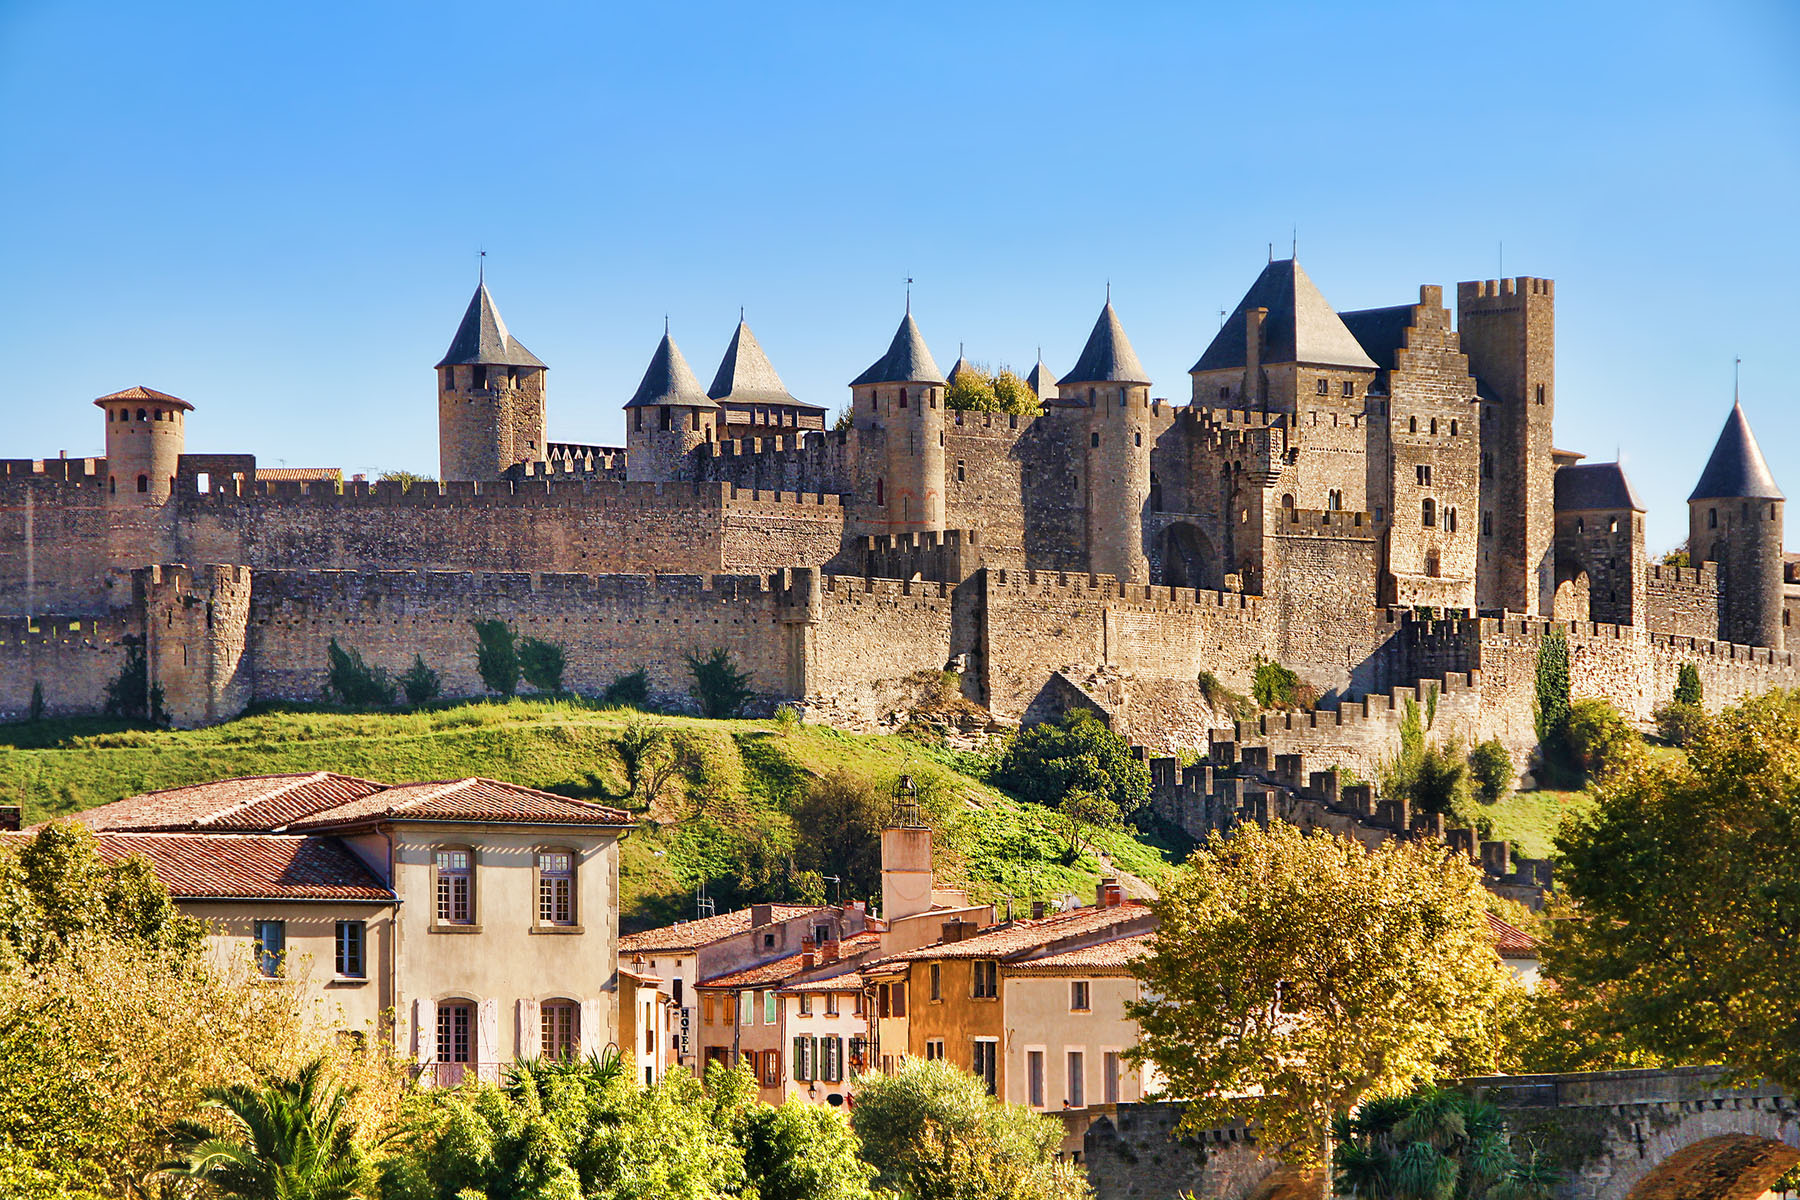 France-Castle of Carcassonne_168186269